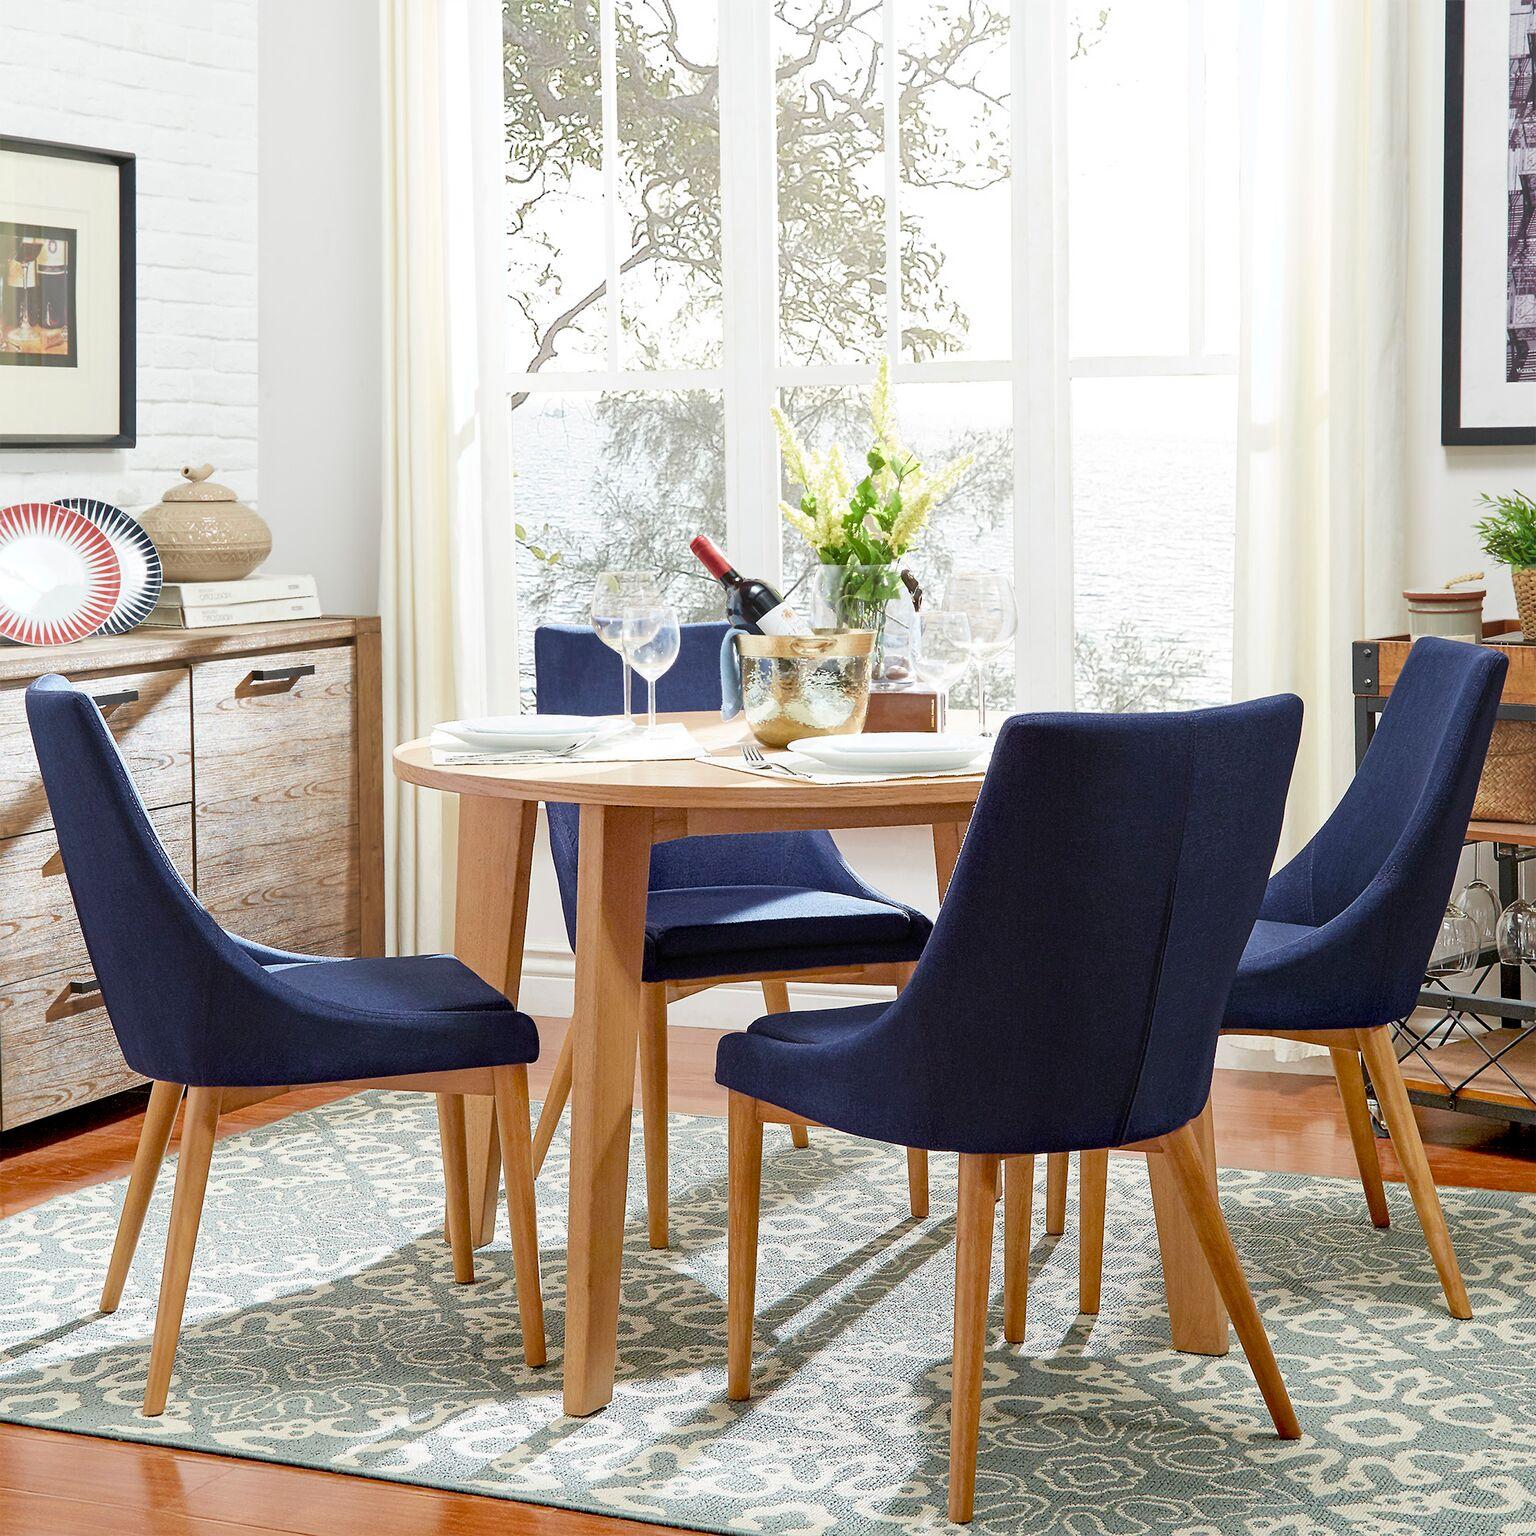 Chelsea Lane Baxter 5-Piece Dining Set, Light Oak